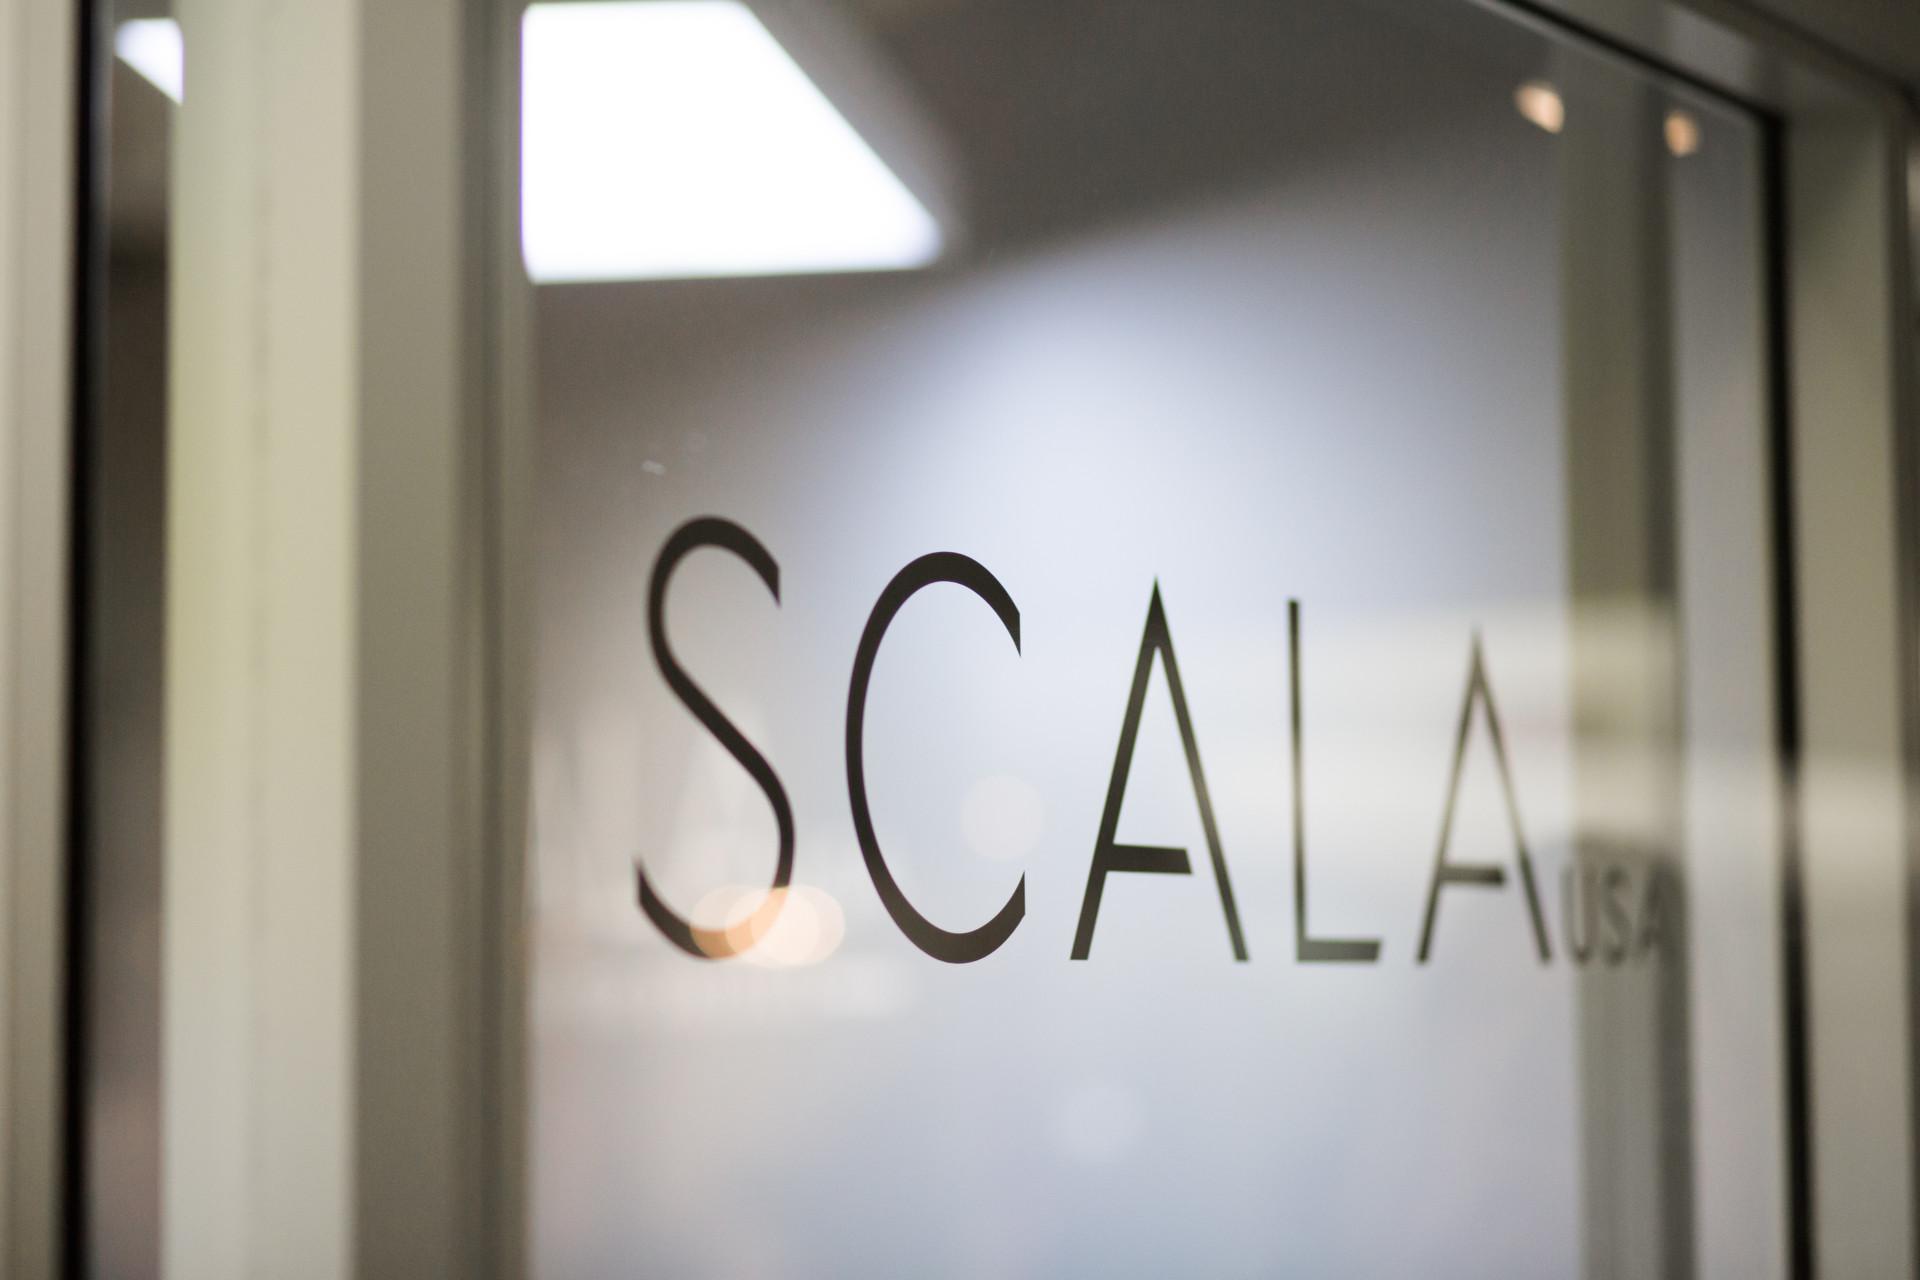 SCALAUSA-1